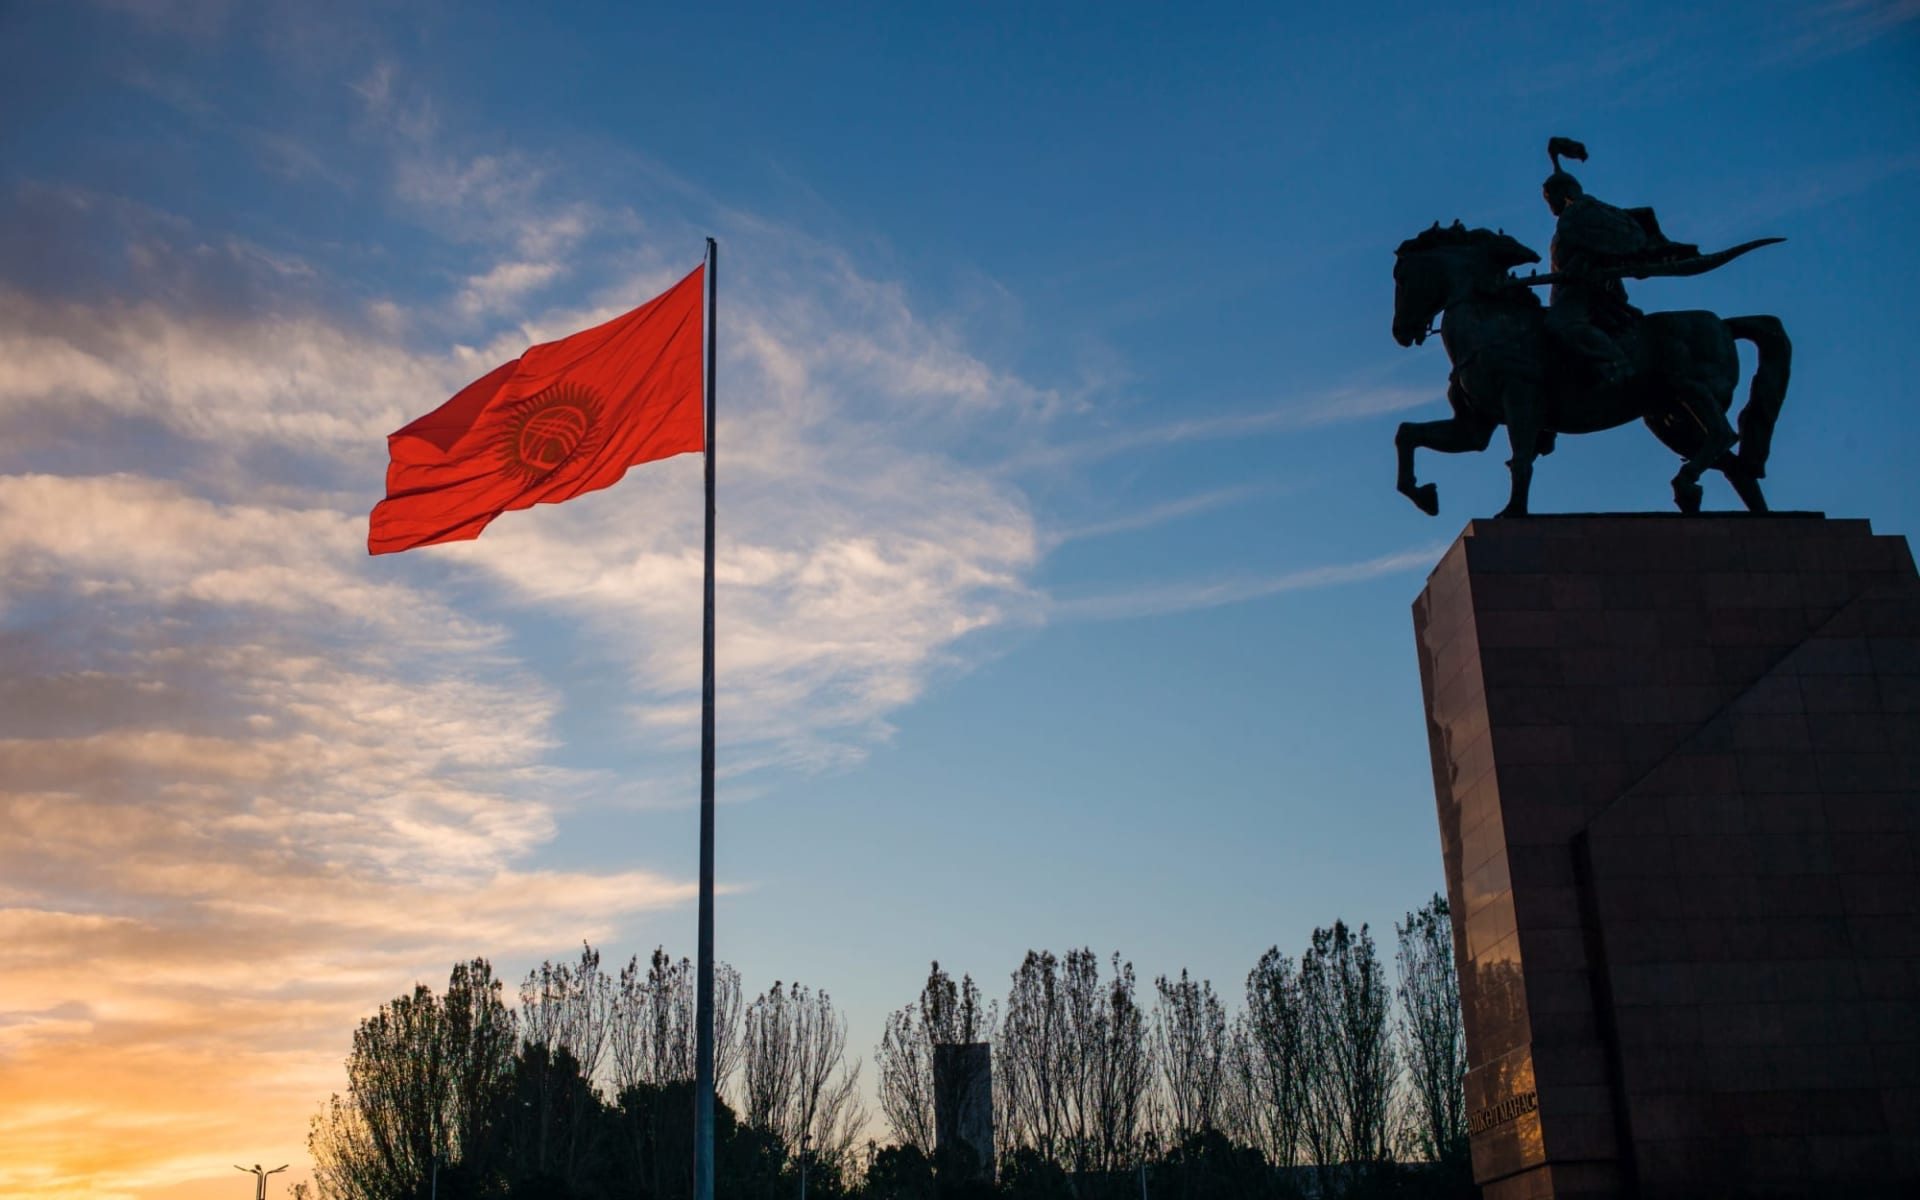 Wandererlebnis Kirgistan ab Bischkek: KI_Bishkek_shutterstock_1383987239_Teow Cek Chuan